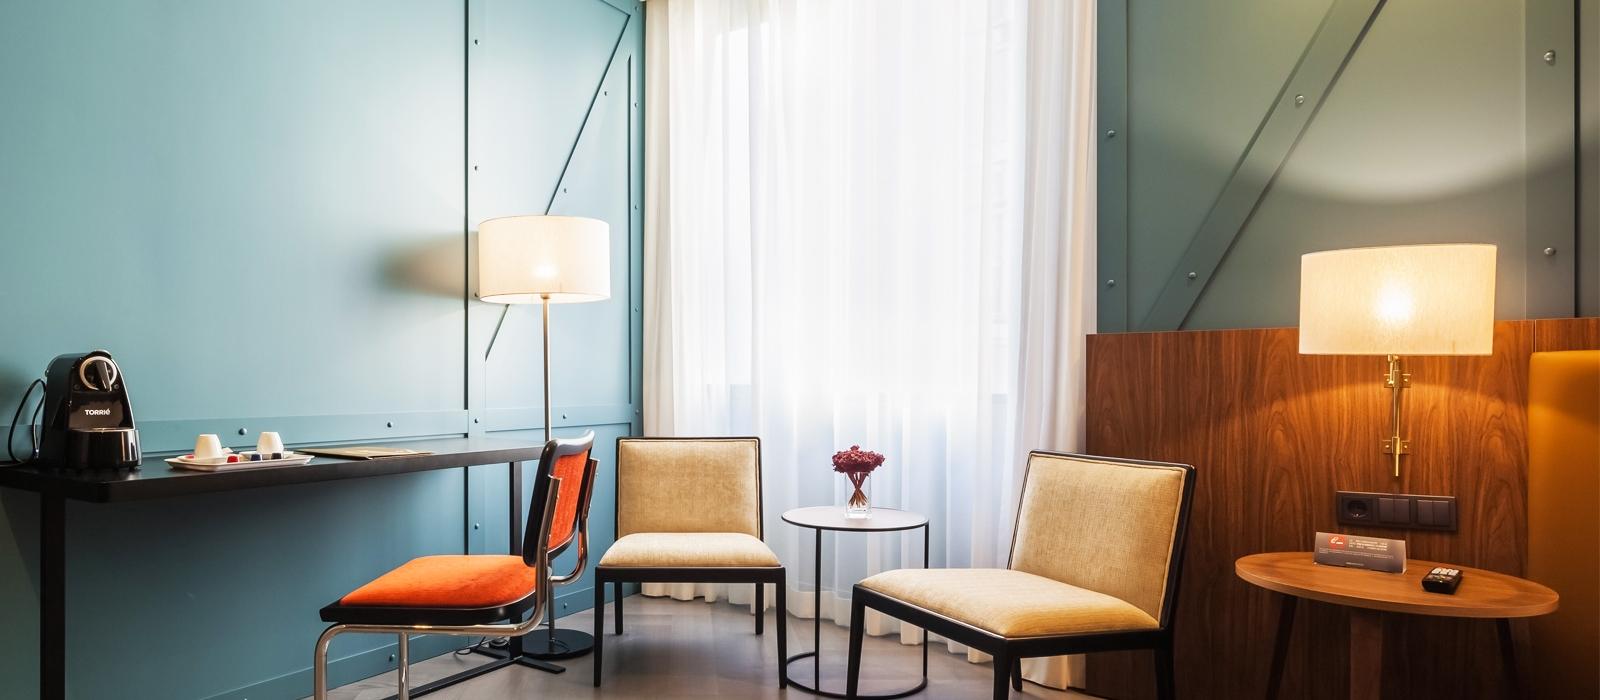 Doppelzimmer.  Hotel Porto - Vincci Hoteles